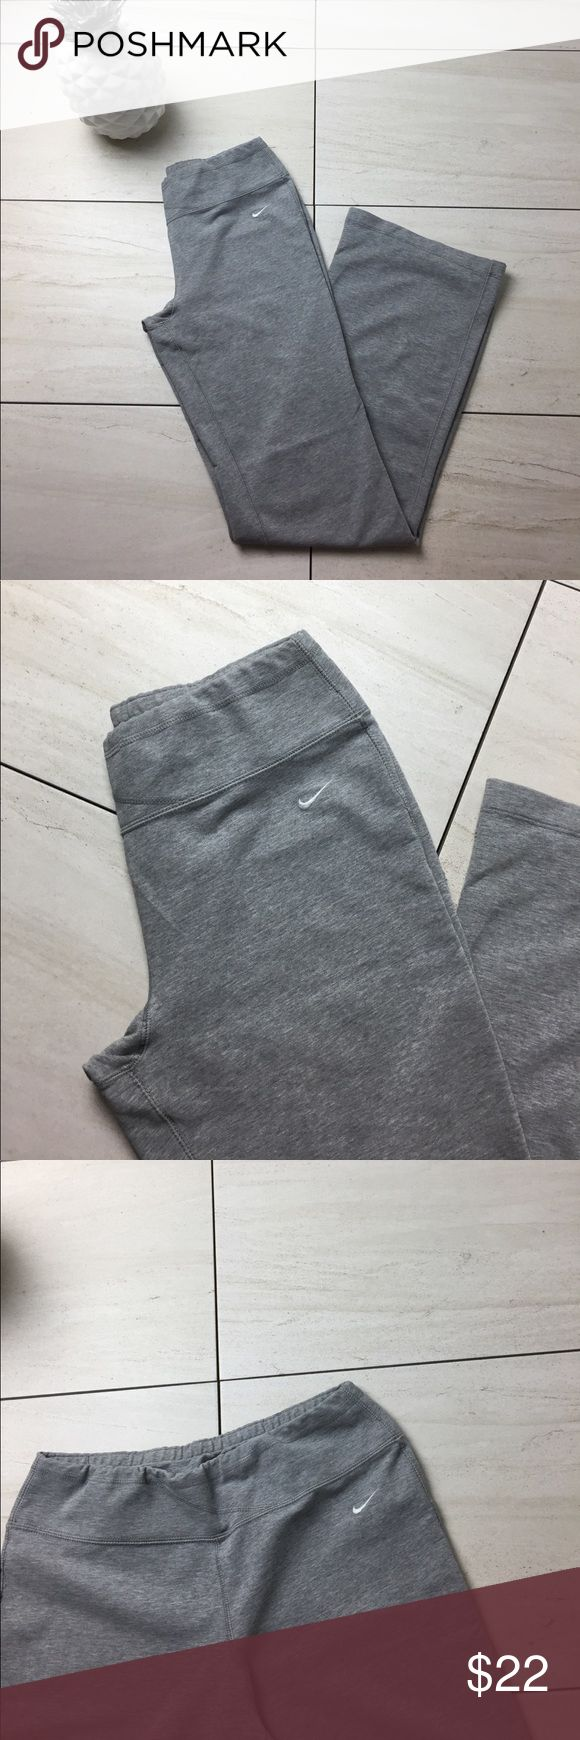 Women's Nike Fit Dry Grey yoga  Pants Medium ✨ Women's Nike Fit Dry Grey yoga  Pants in great condition. Like new. Look very nice on. Women's size medium. 8-10. Nike Pants Leggings